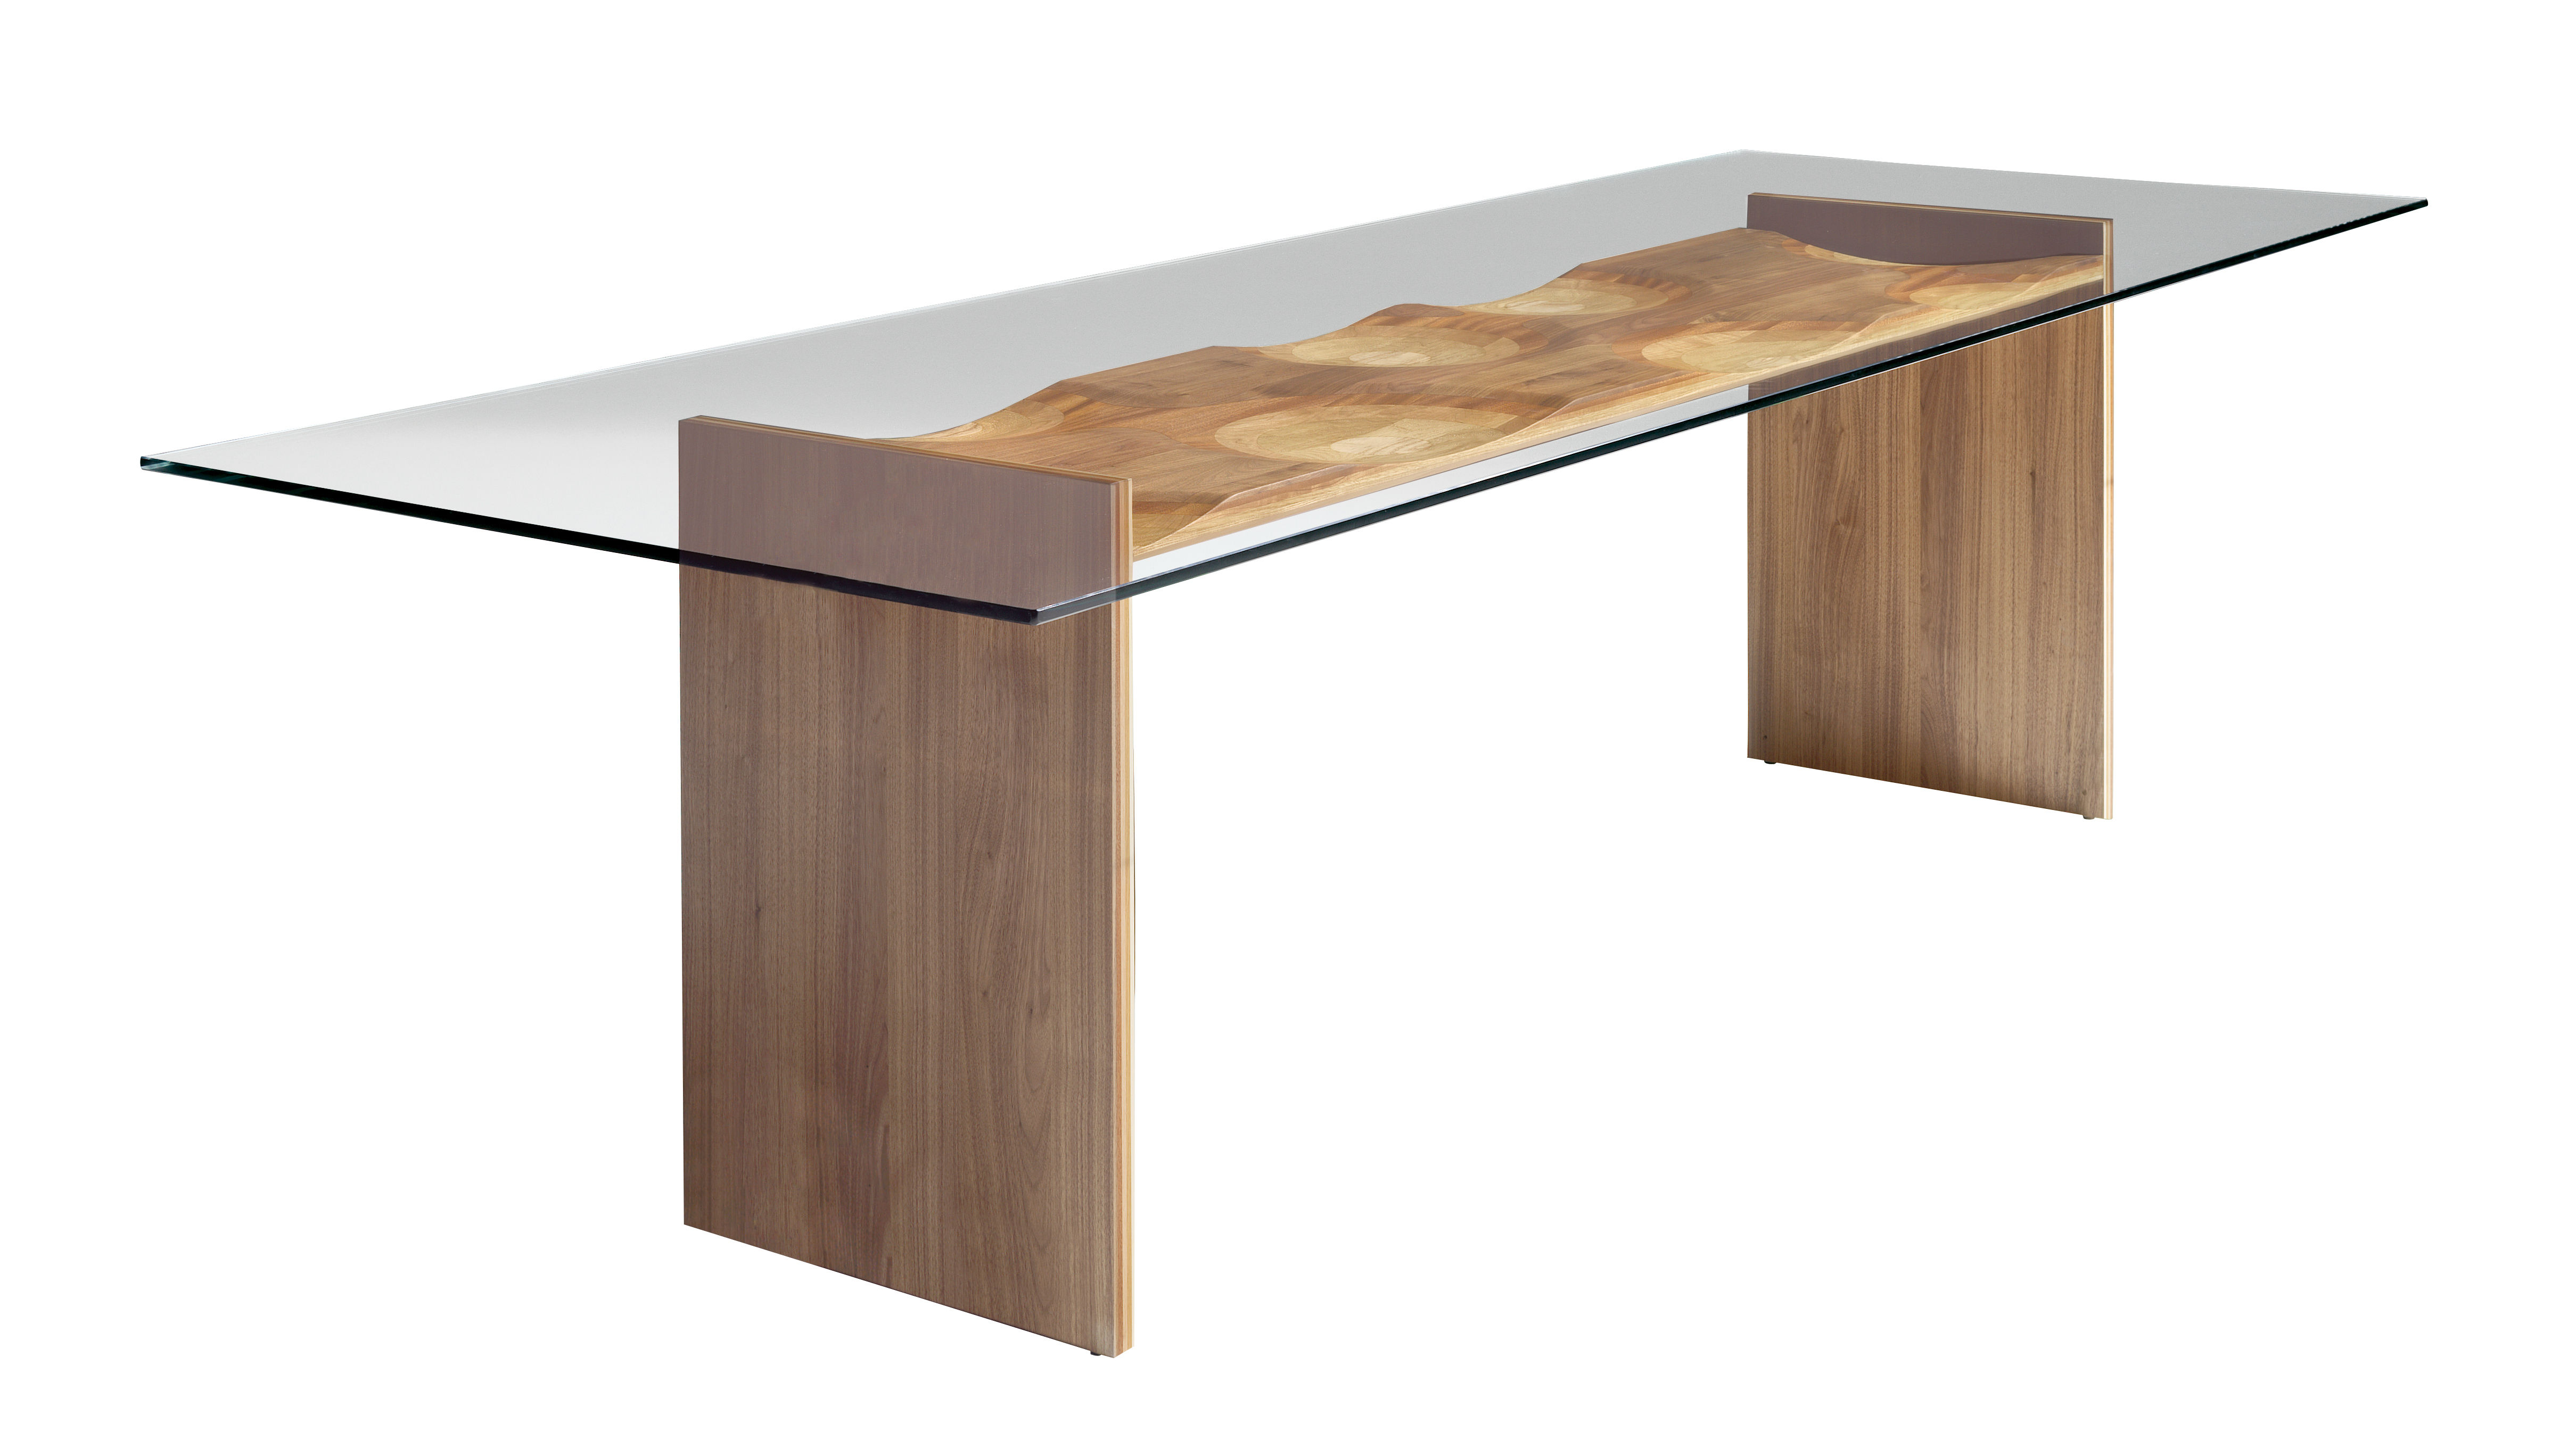 table rectangulaire ripples horm transparent bois h. Black Bedroom Furniture Sets. Home Design Ideas